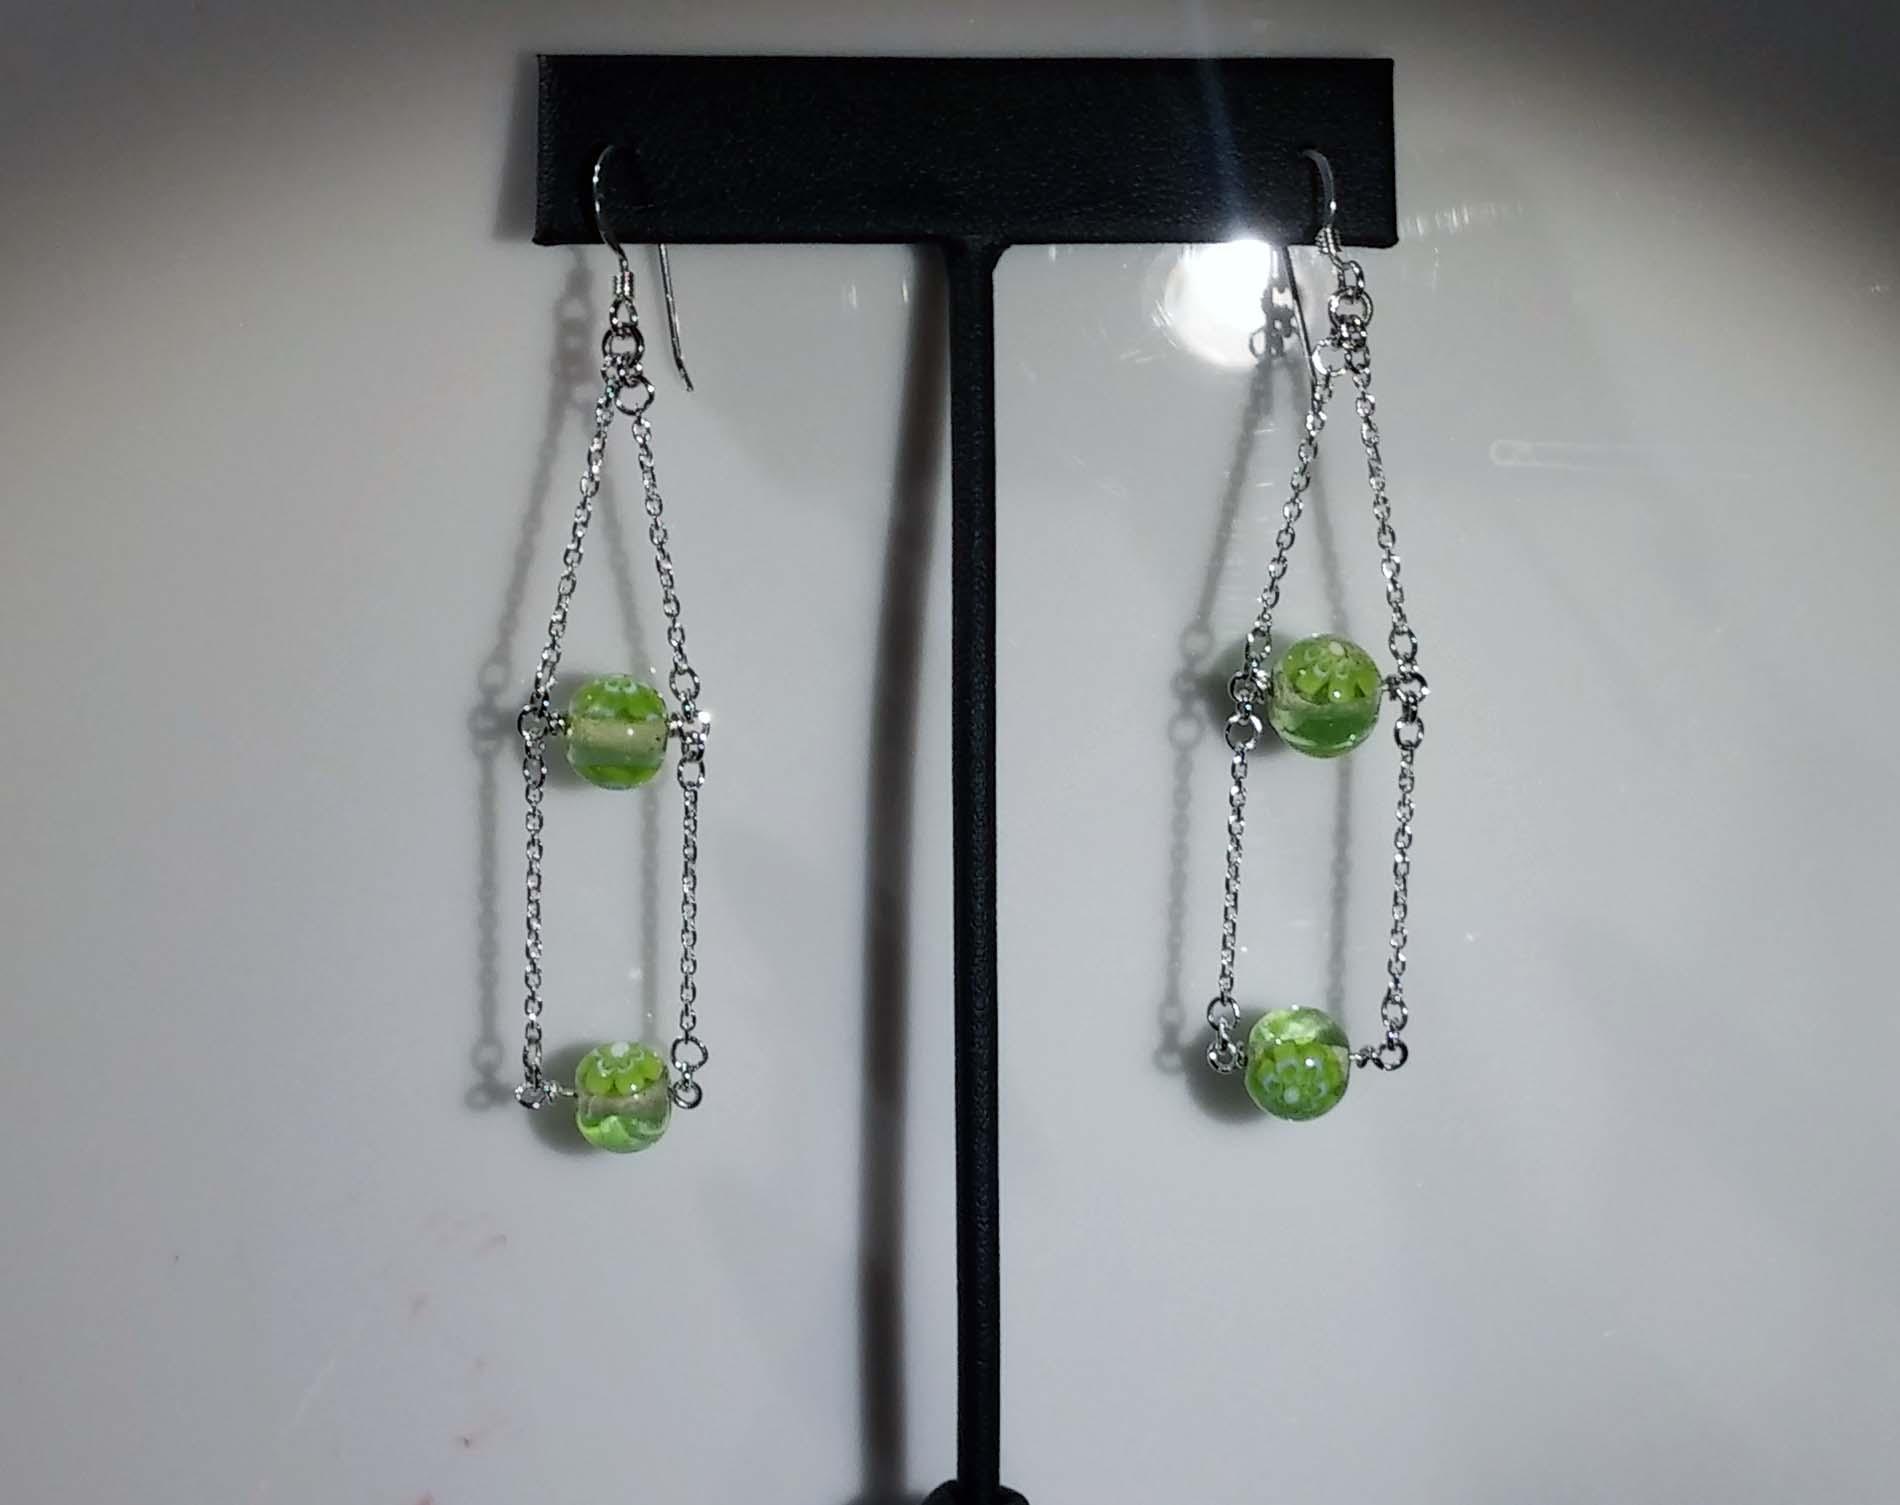 Hanging Green Beads Earrings